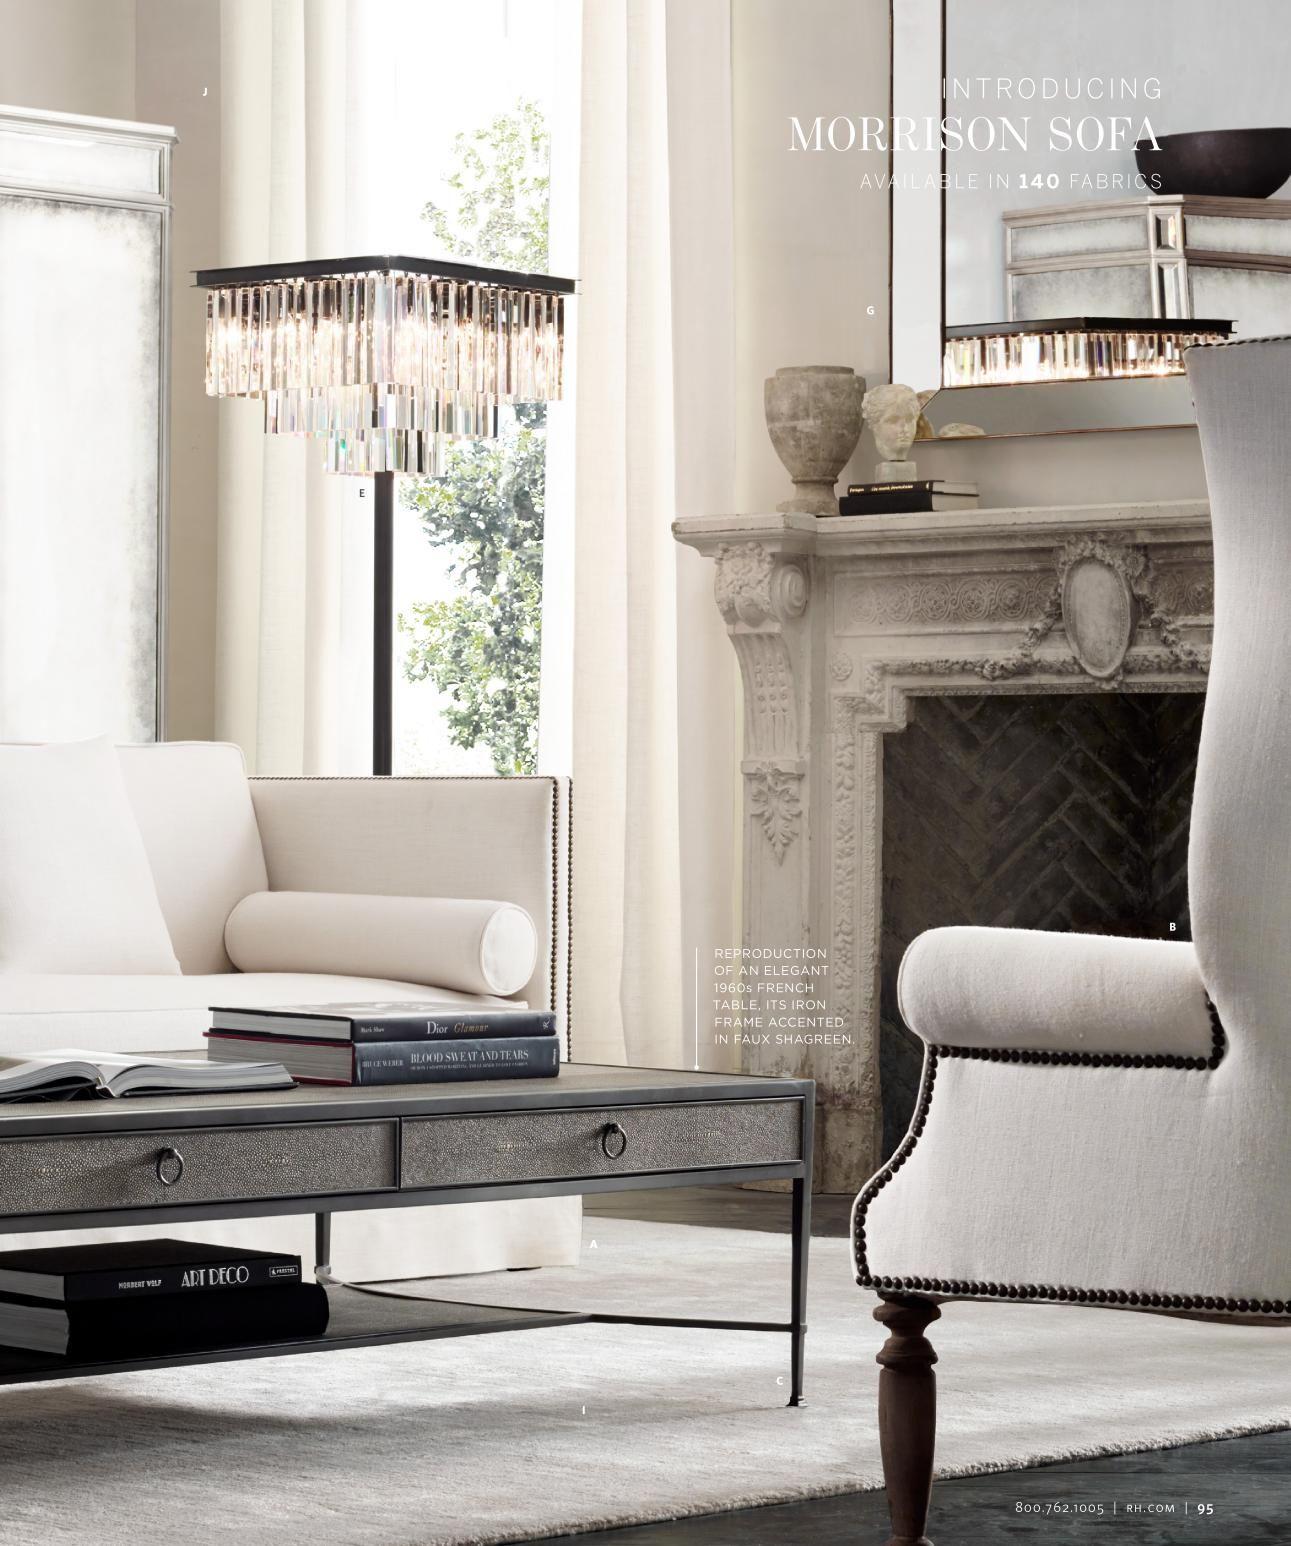 Restoration Hardware Is The Worlds Leading Luxury Home Furnishings Purveyor,